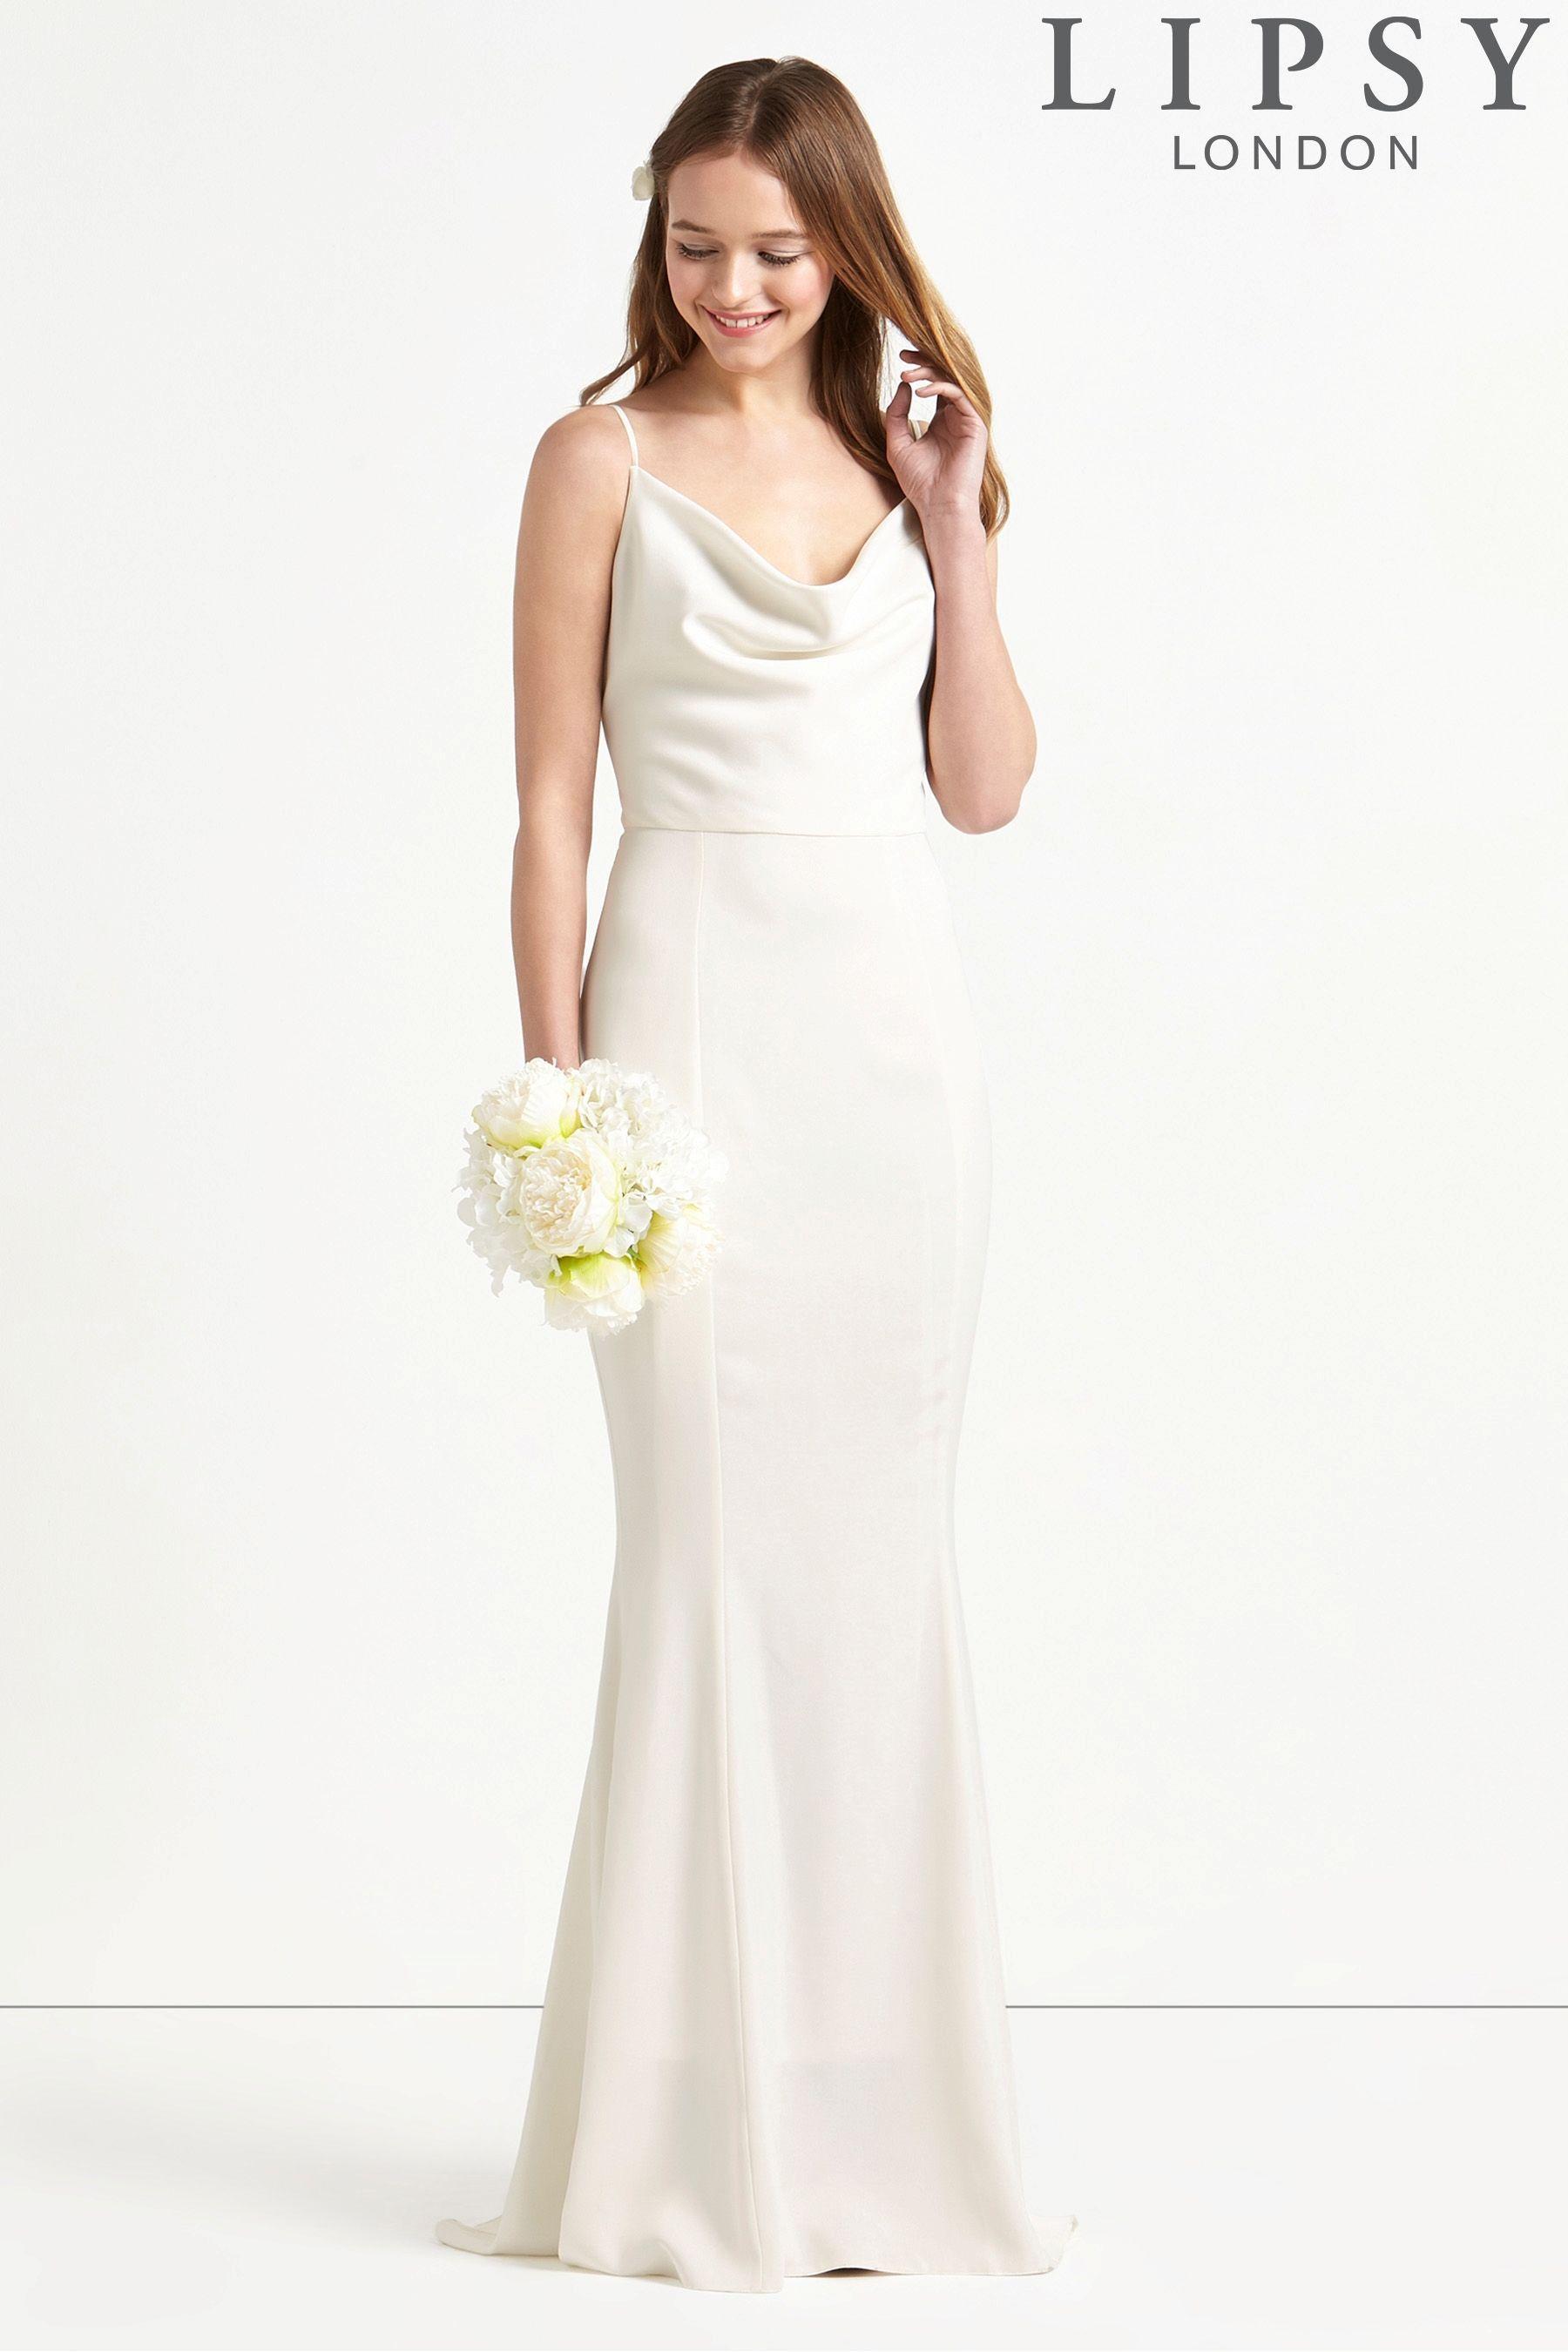 Pin By Kamile Jasiunaite On Bridesmaids Cowl Neck Wedding Dress Short Wedding Dress Lipsy Dresses